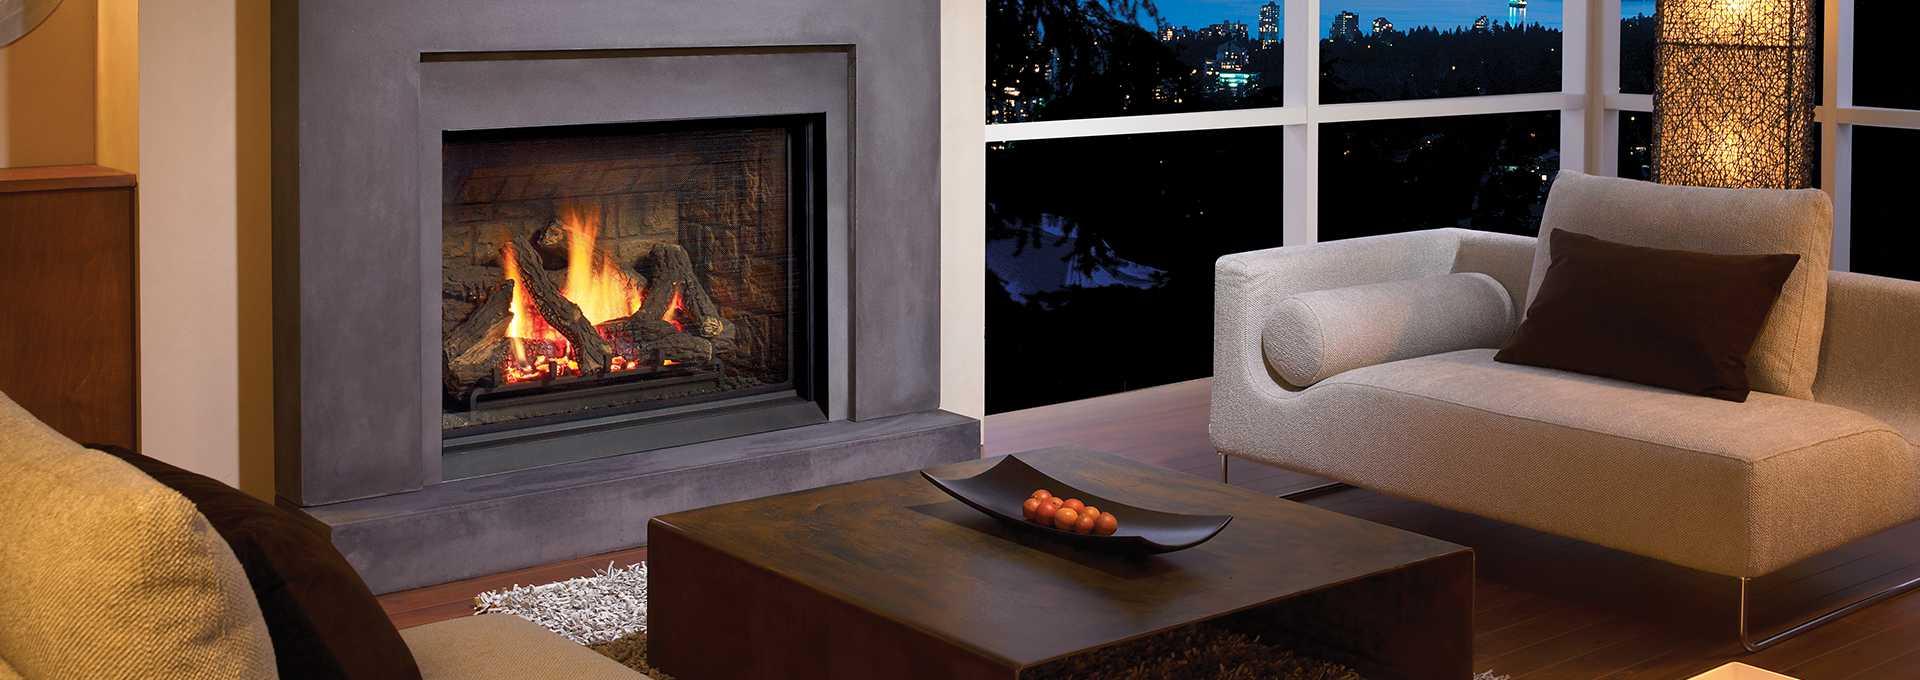 bellavista b36xtce gas fireplace gas fireplaces regency